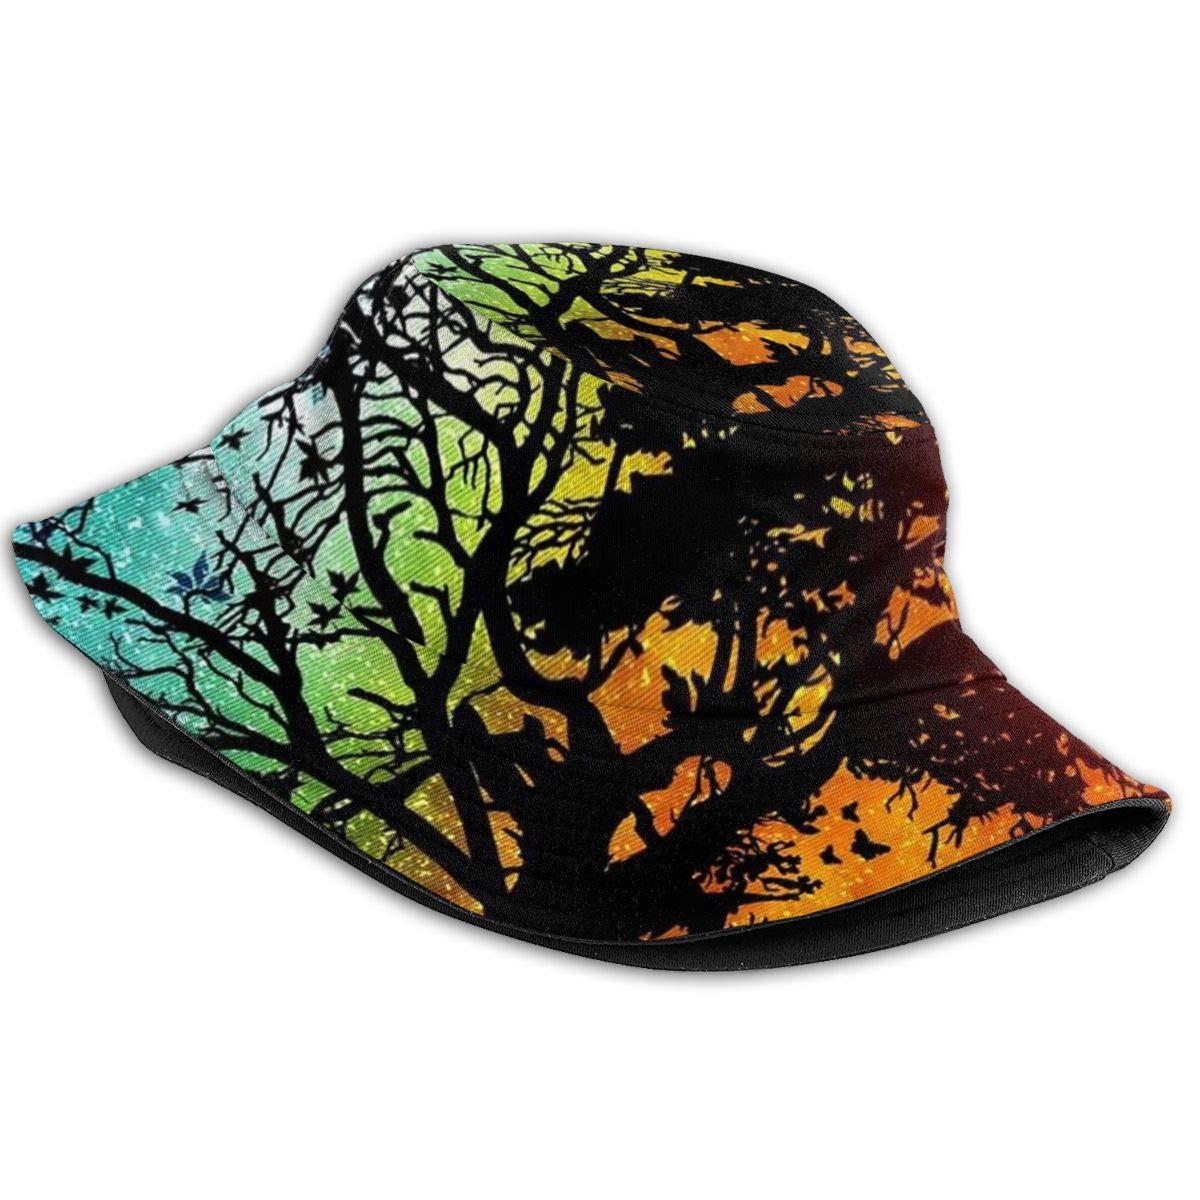 Unisex 100/% Polyester Forest Tree Art Life Tree Moon Night Sun Day Baseball Cap Low Profile Trucker Baseball Cap for Unisex